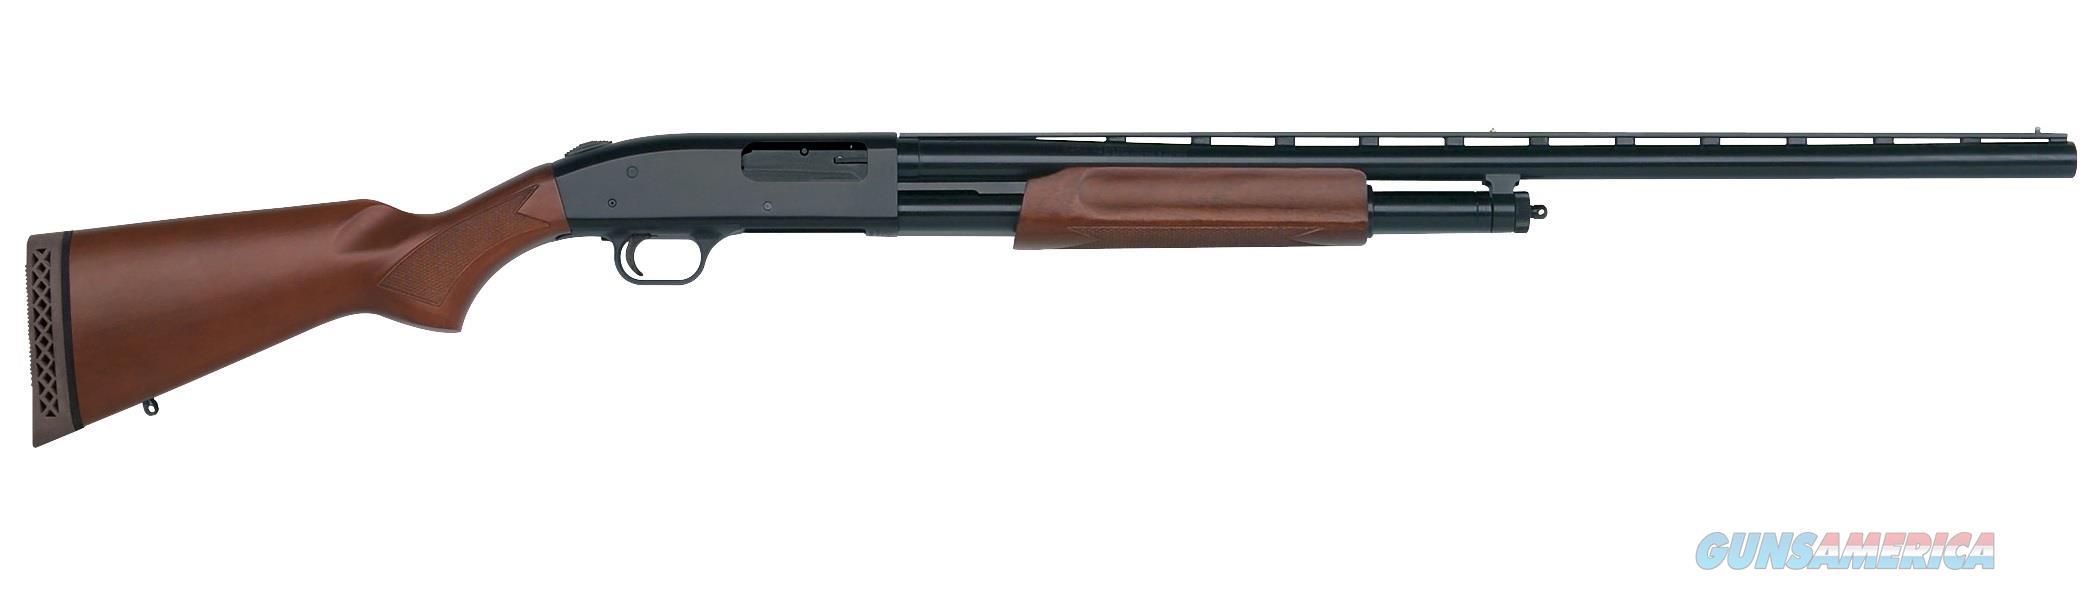 "Mossberg 500 Hunting All Purpose Field 12 Gauge 28"" 50120   Guns > Shotguns > Mossberg Shotguns > Pump > Sporting"